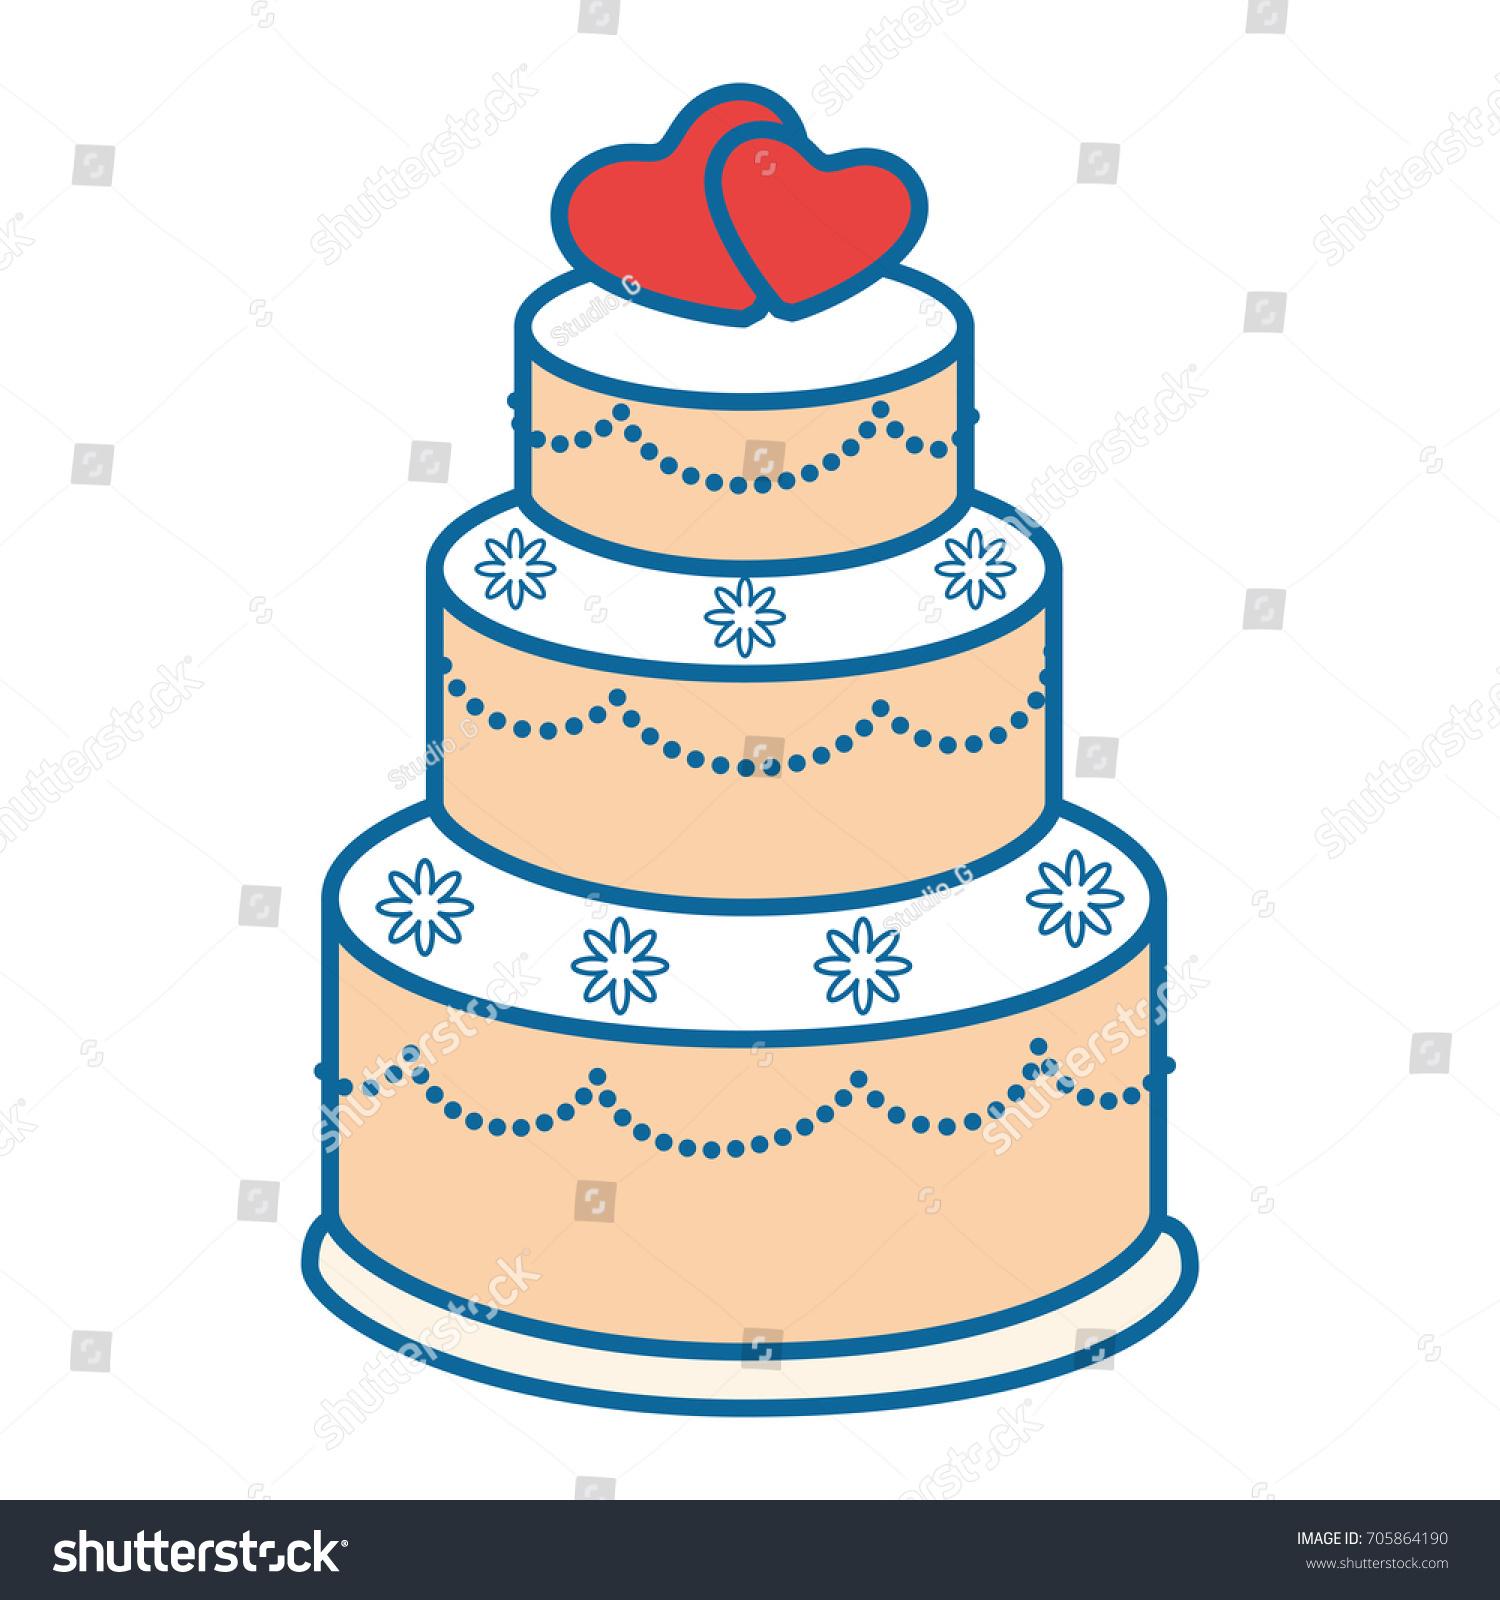 Wedding Cake Icon Stock Vector 705864190 - Shutterstock